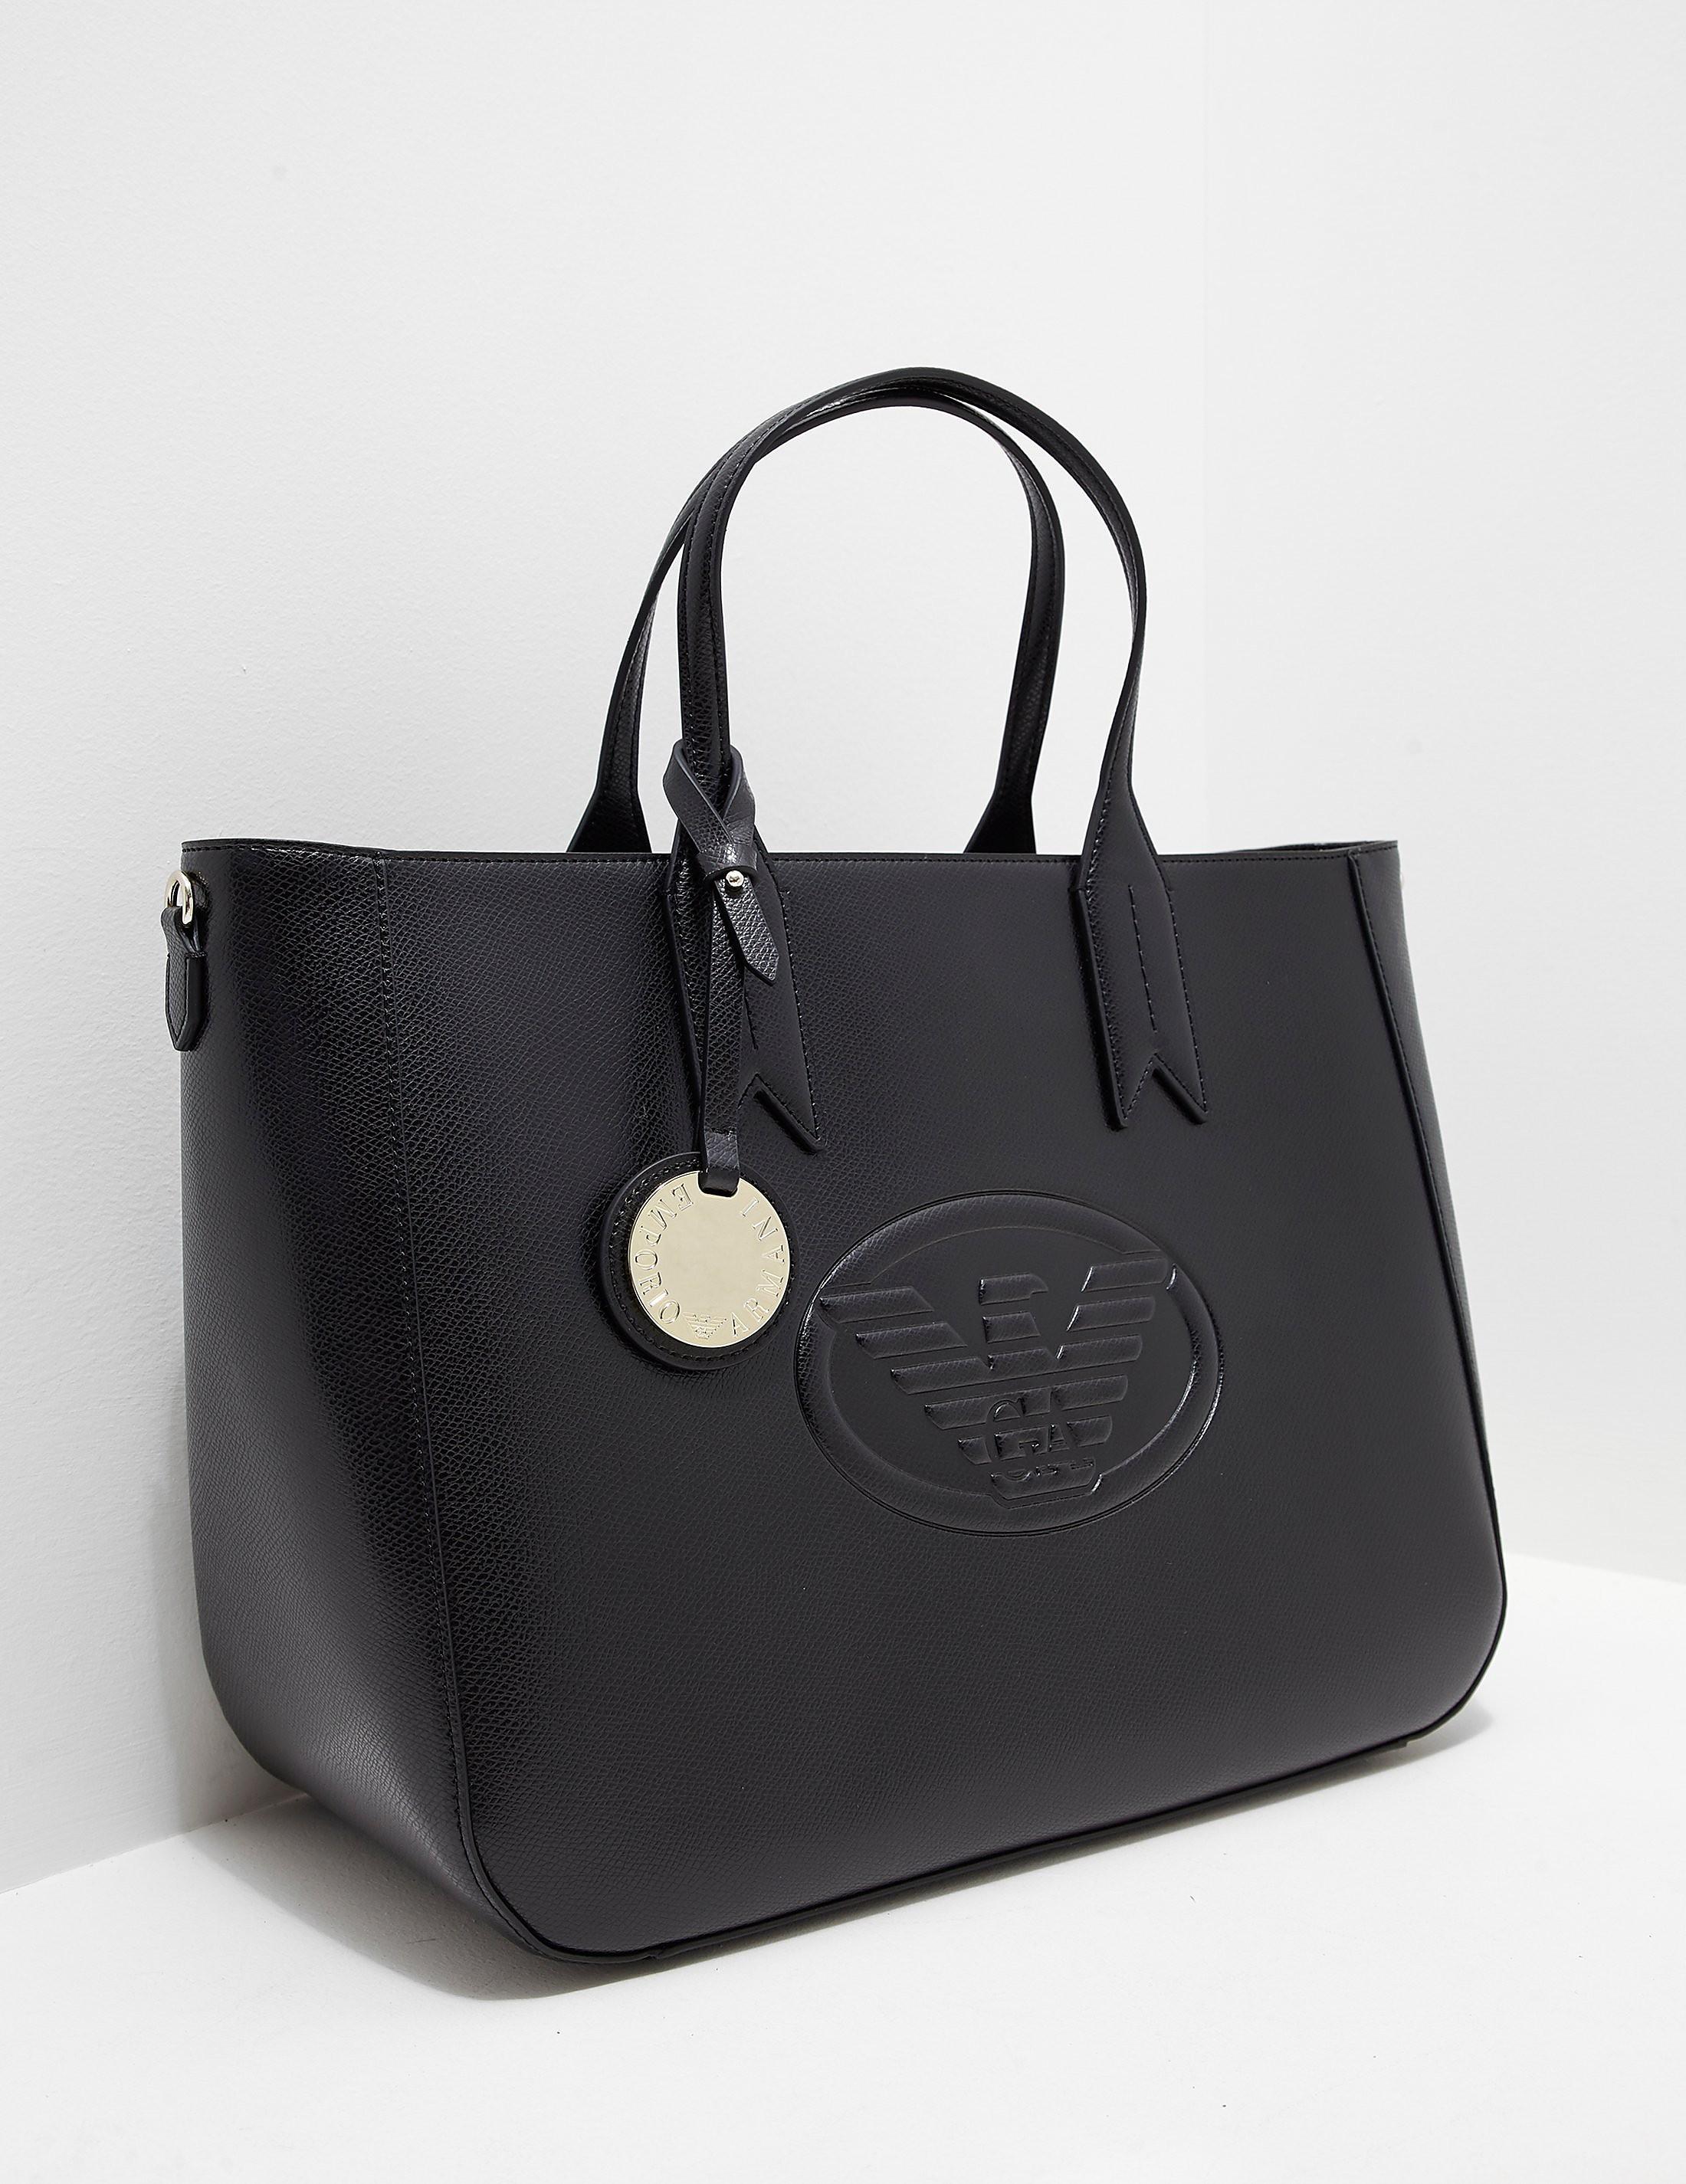 Emporio Armani Logo Tote Bag